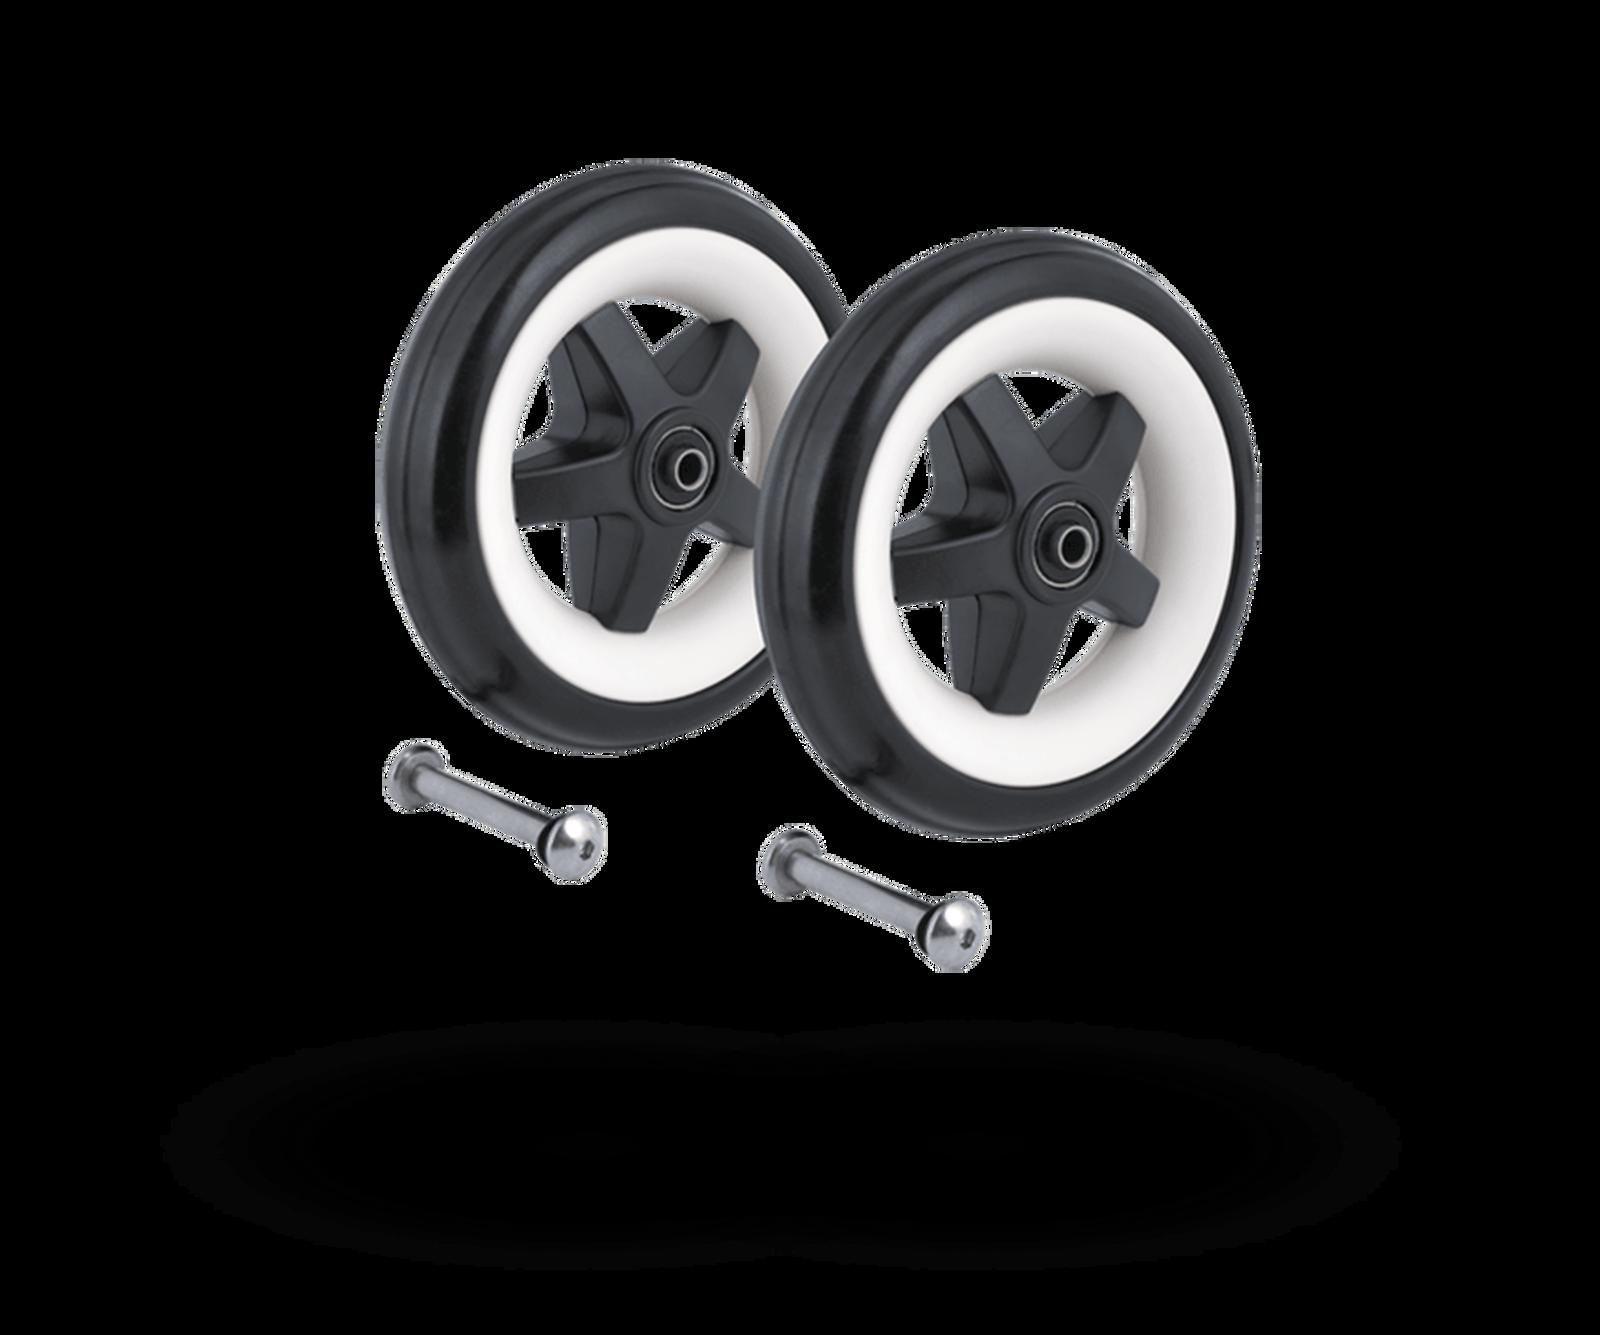 Bugaboo Bee (2010 model) rear wheels replacement set